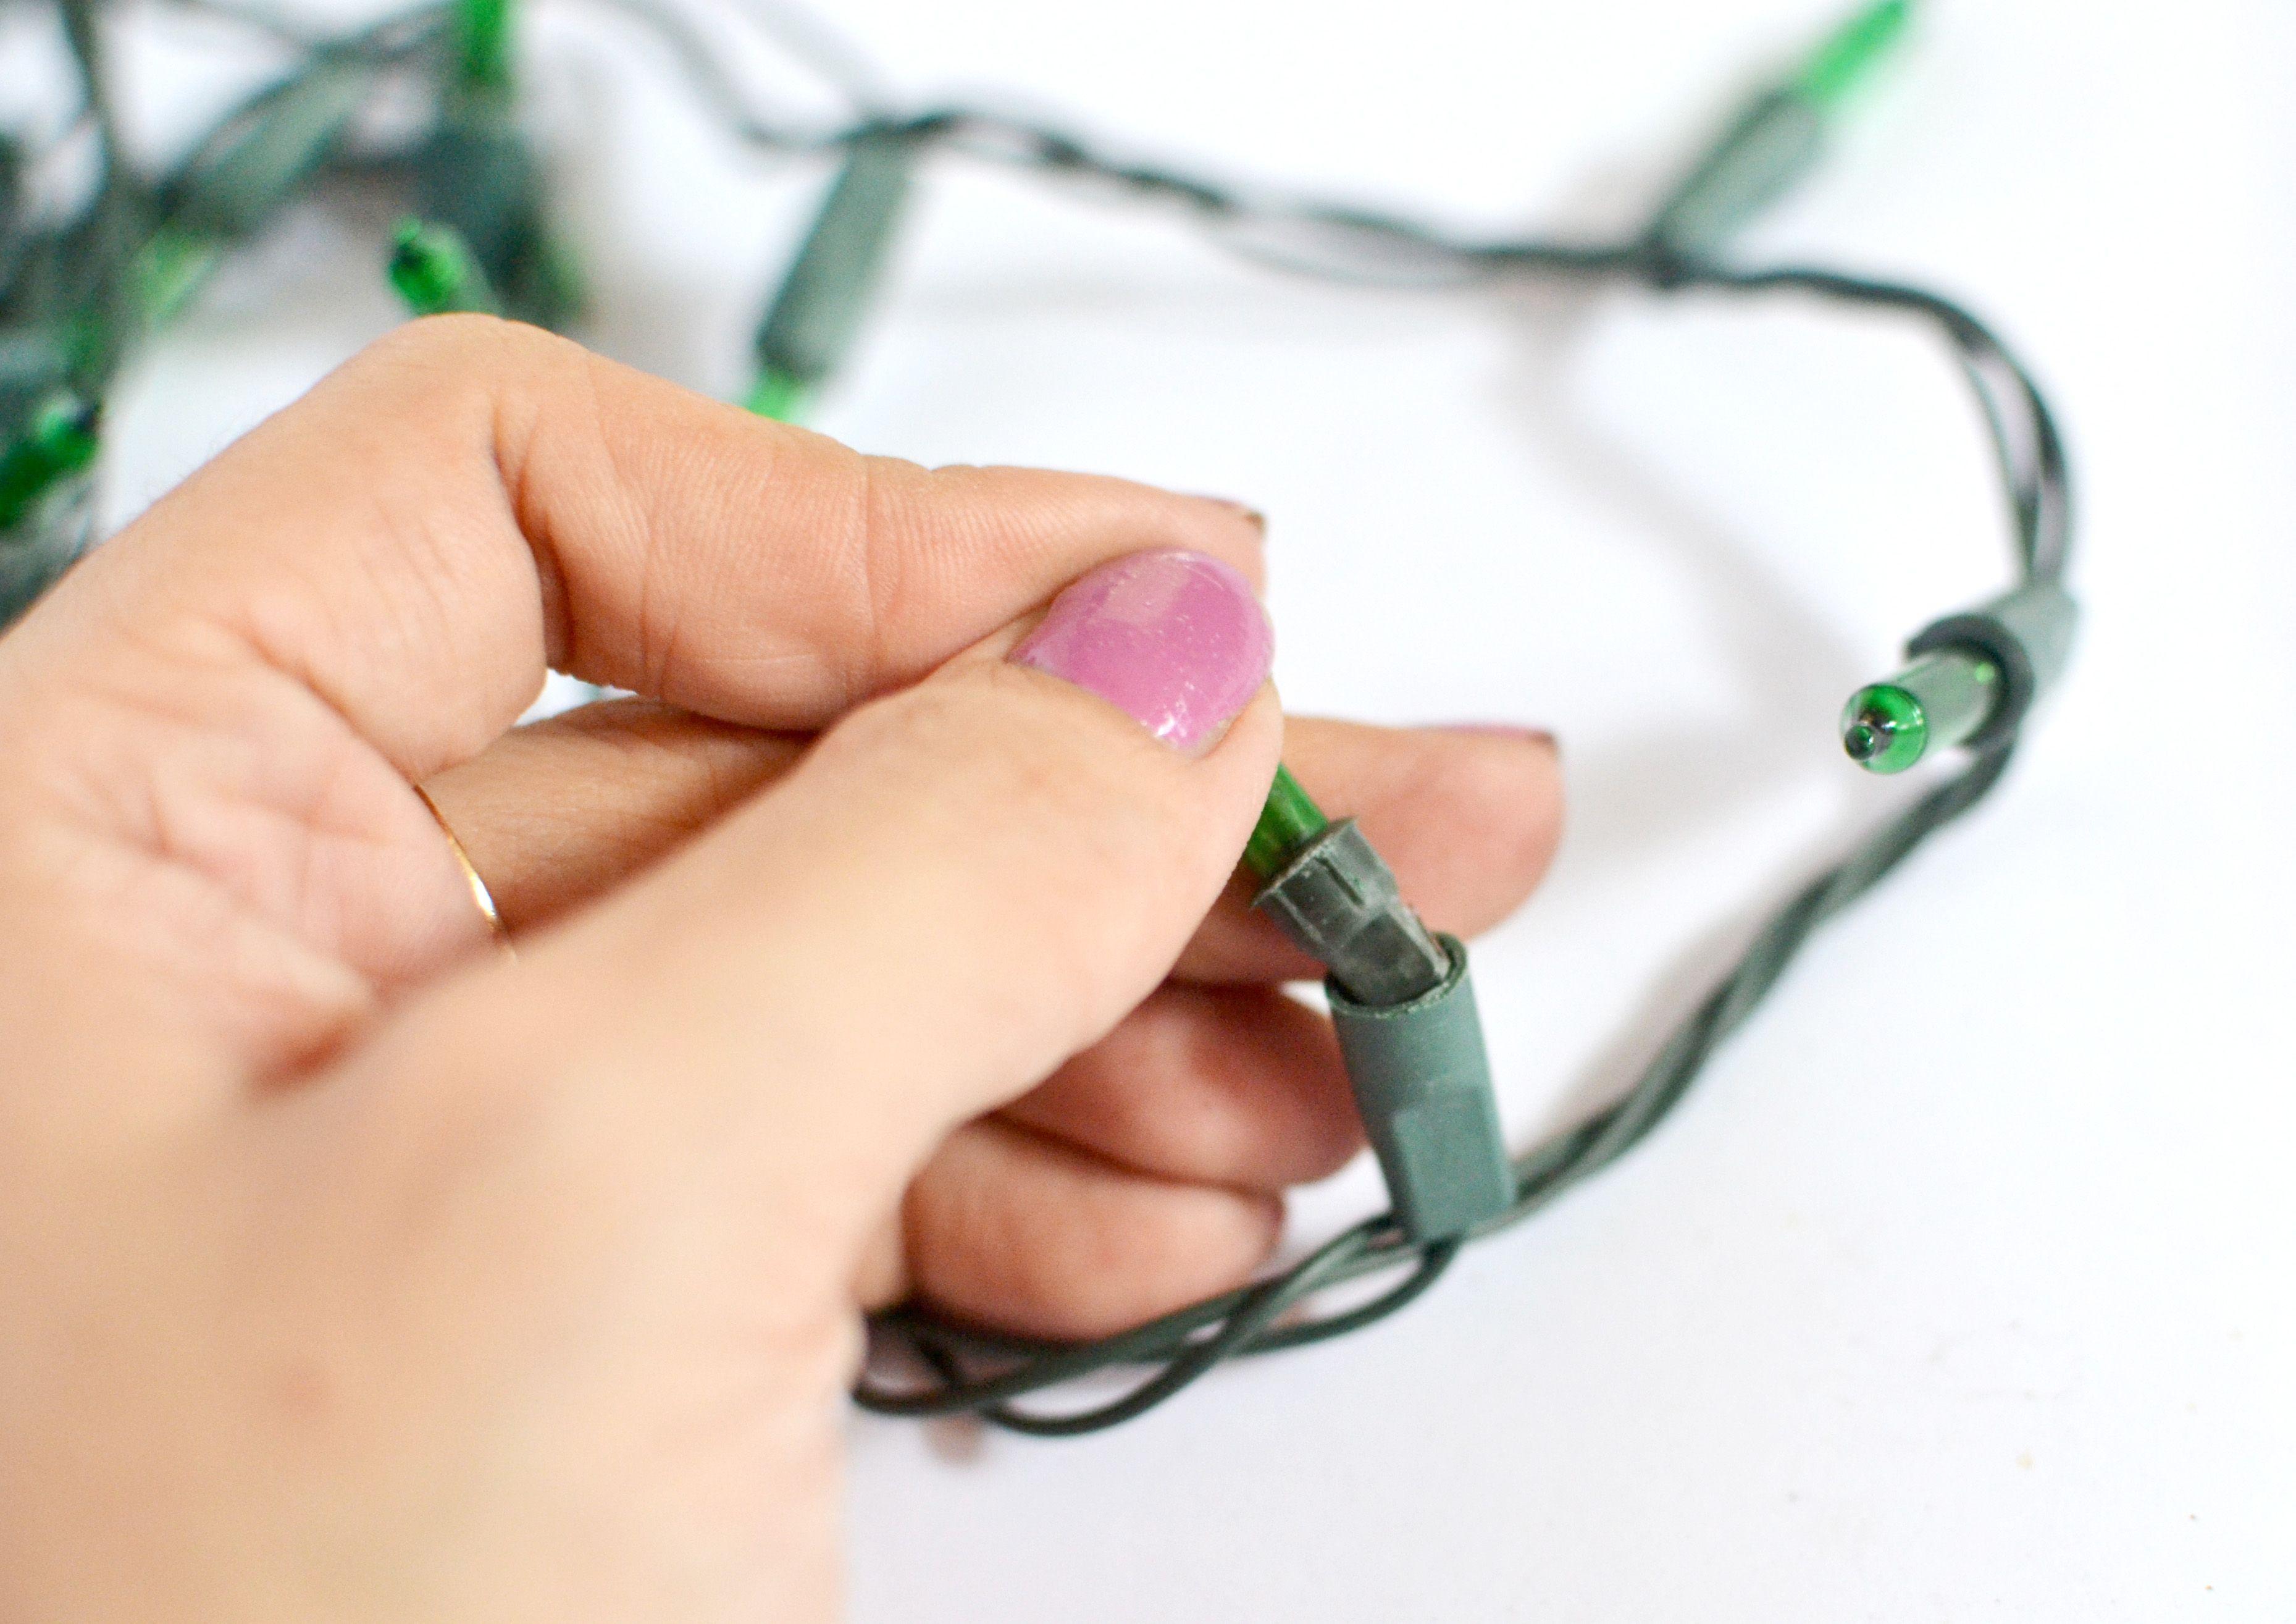 Fix Christmas Lights.Fix Christmas Lights Wikihow Tips Tricks Fix Christmas